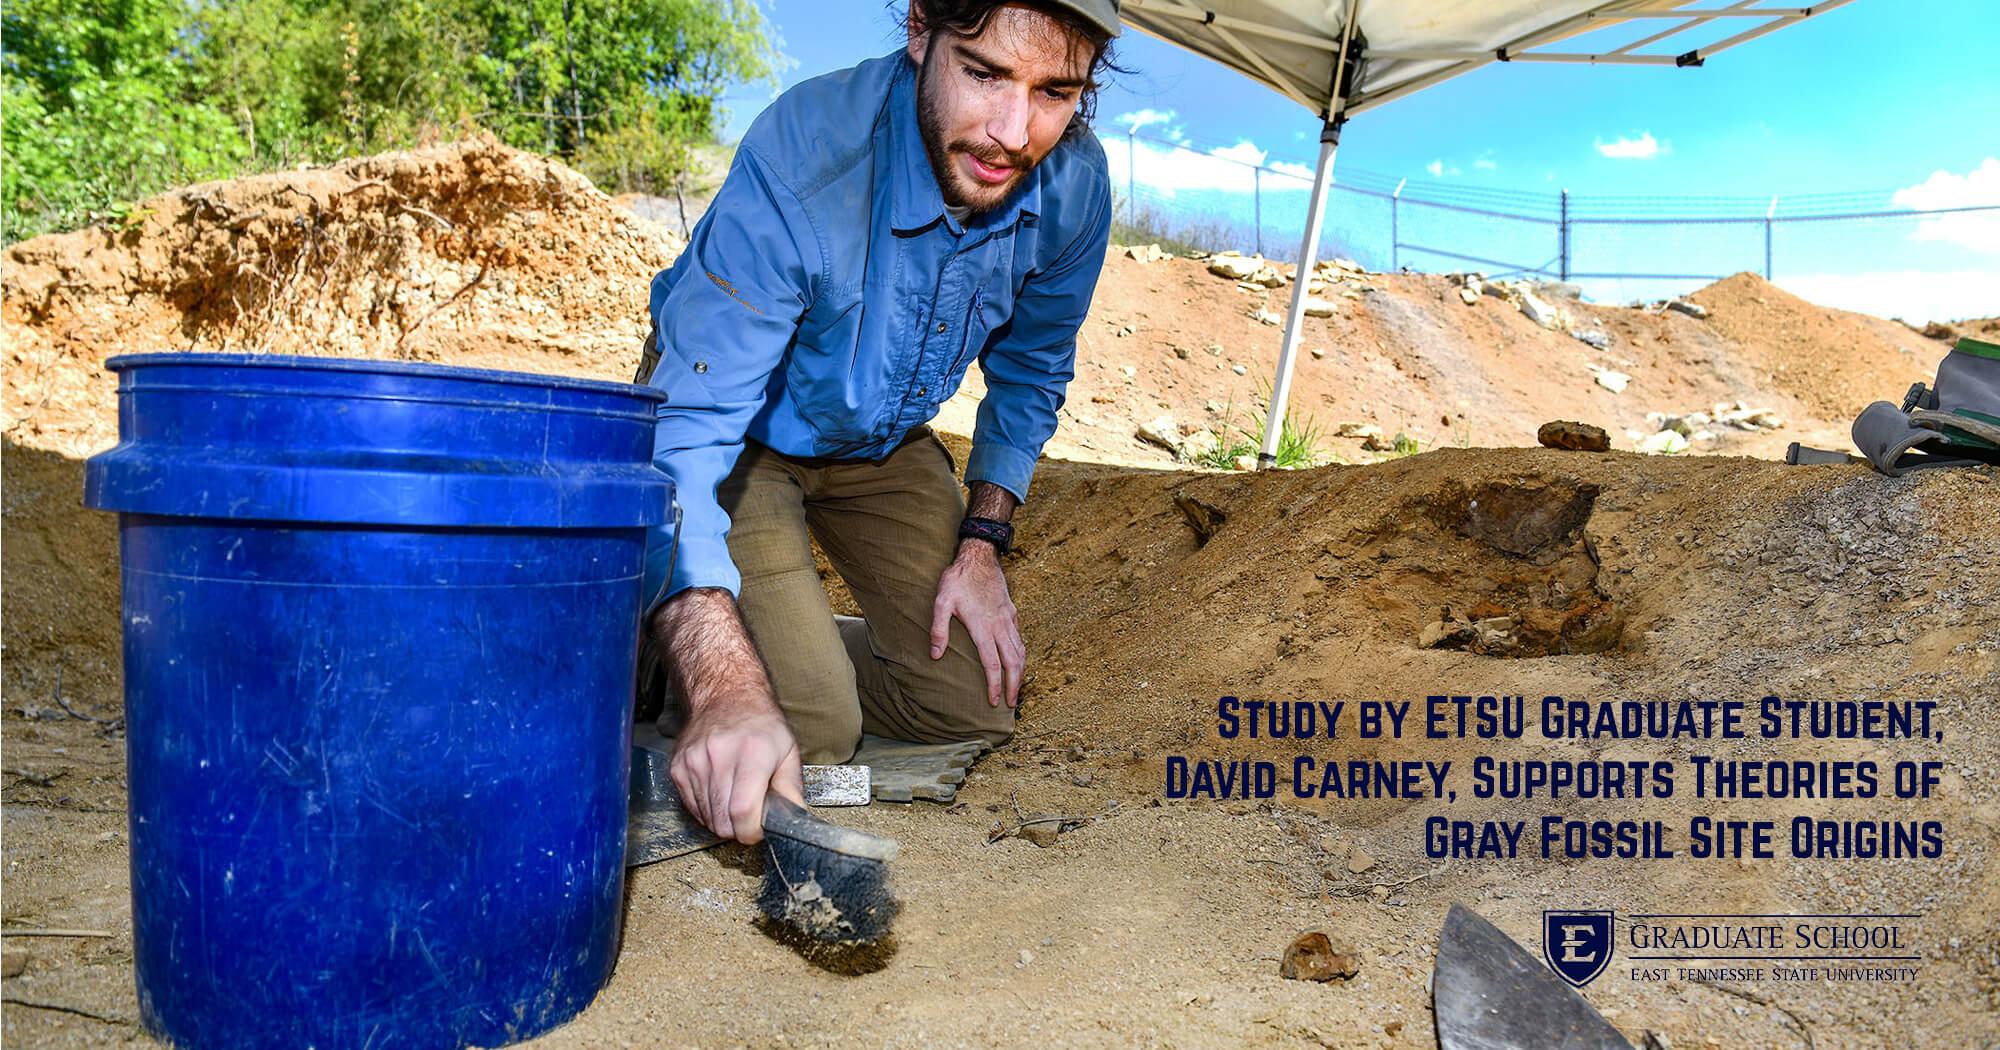 ETSU News: Study by ETSU grad supports theories of Gray Fossil Site origins